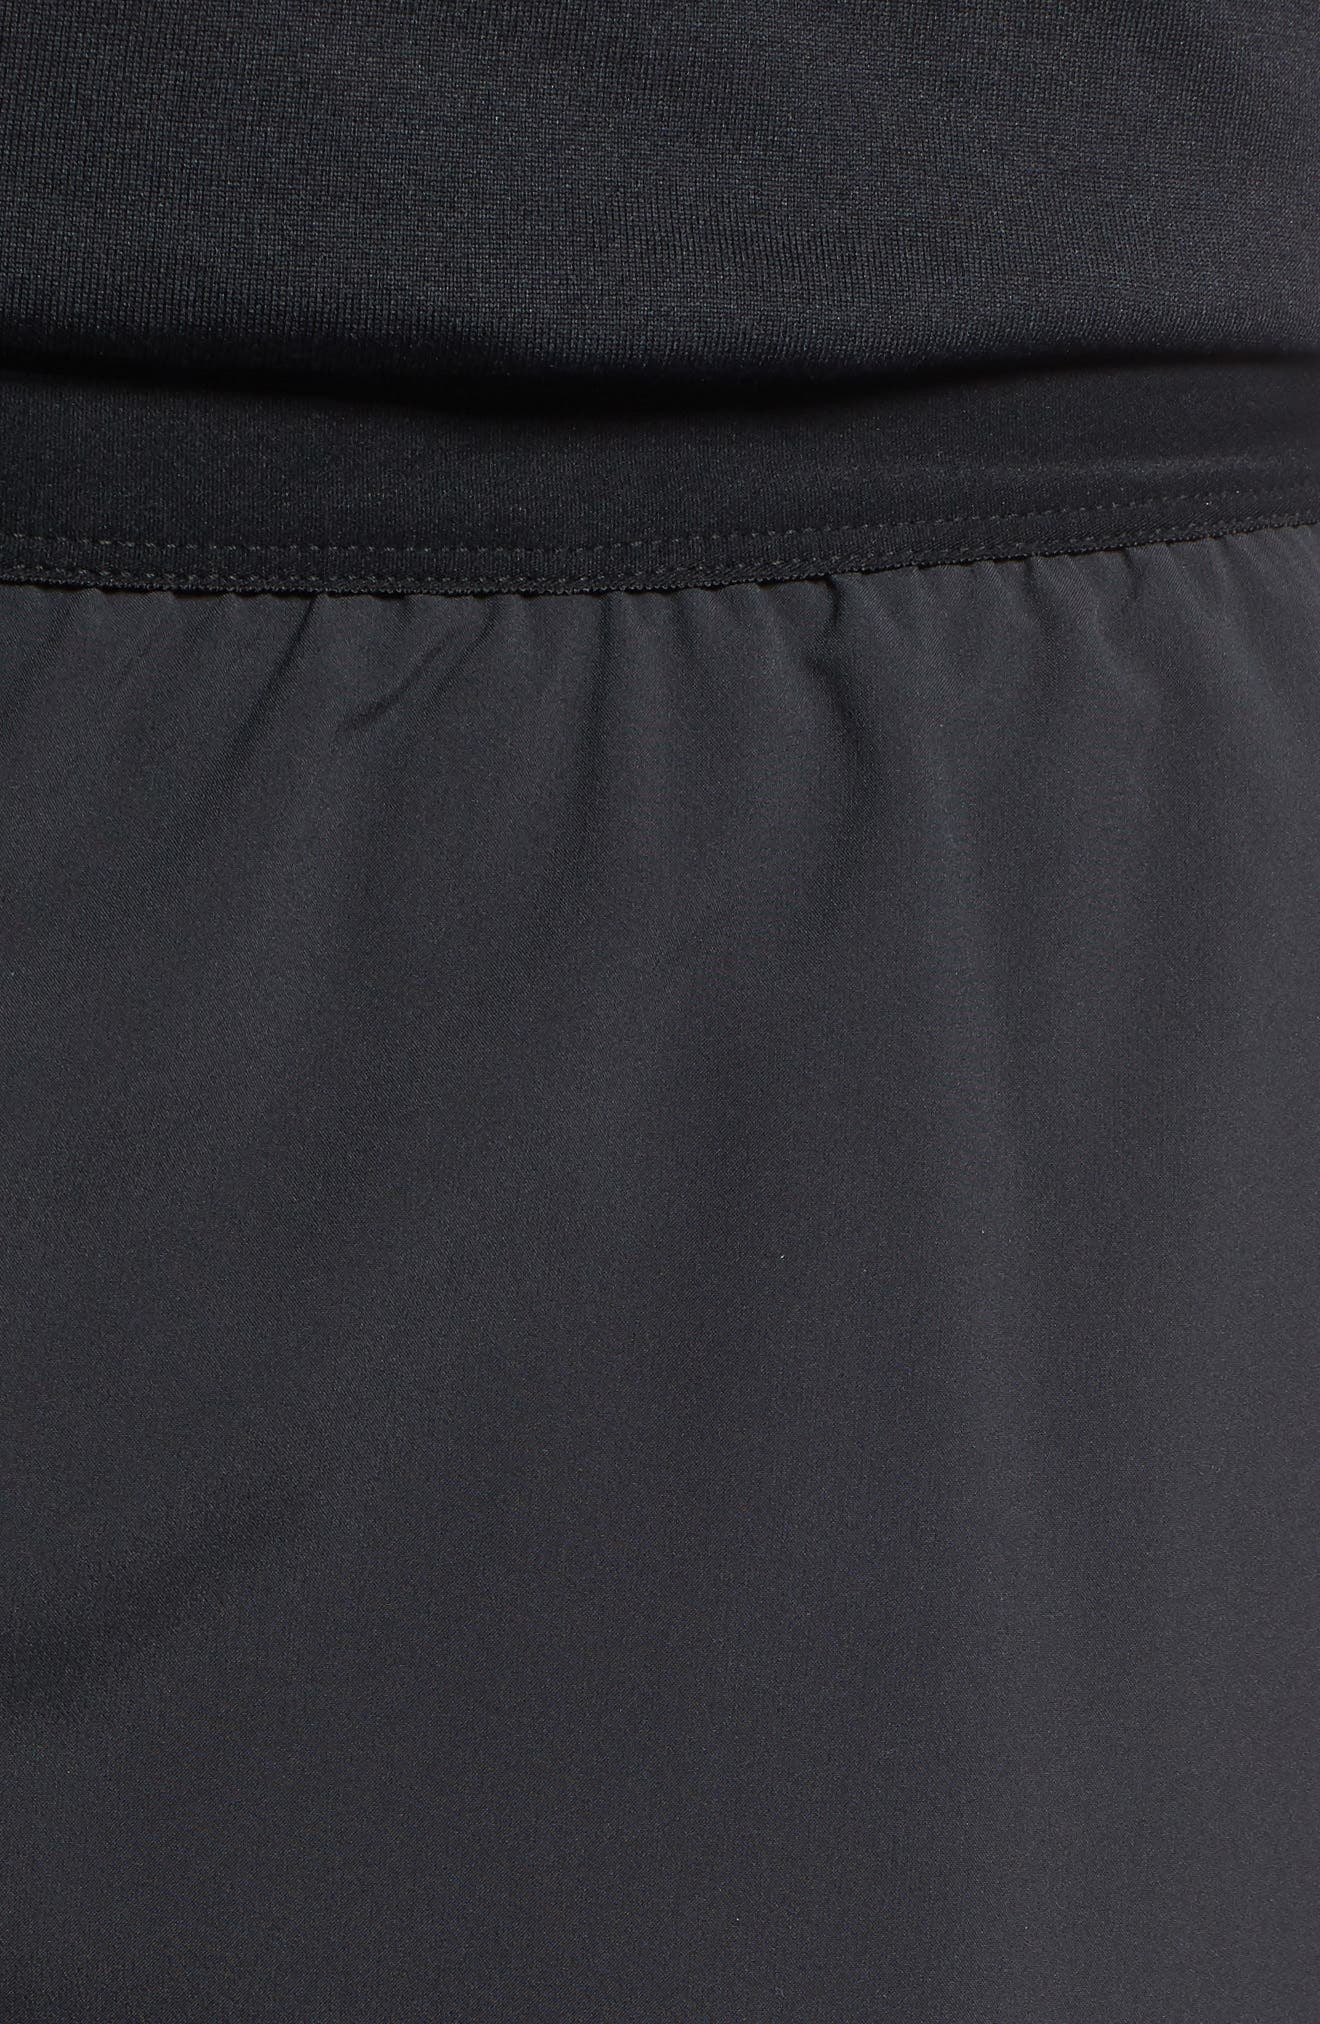 Flex Distance Running Shorts,                             Alternate thumbnail 4, color,                             Black/ Black